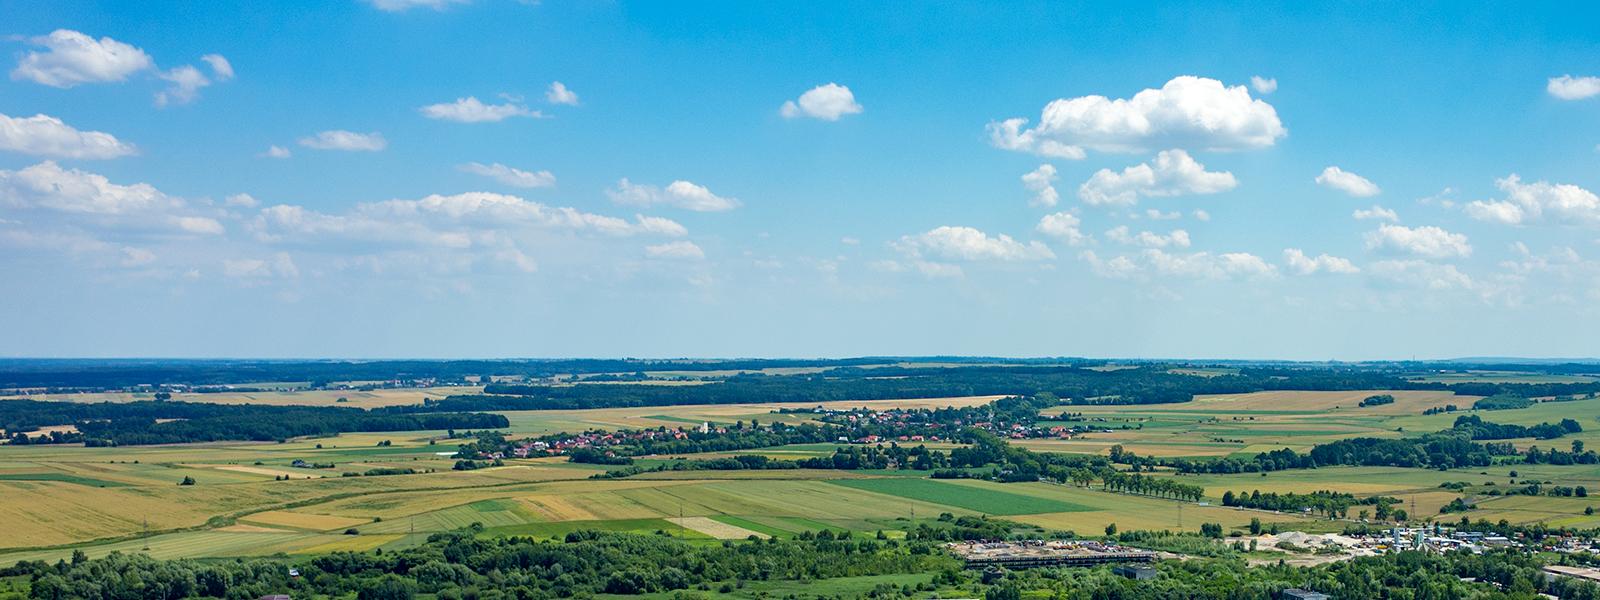 farm country landscape